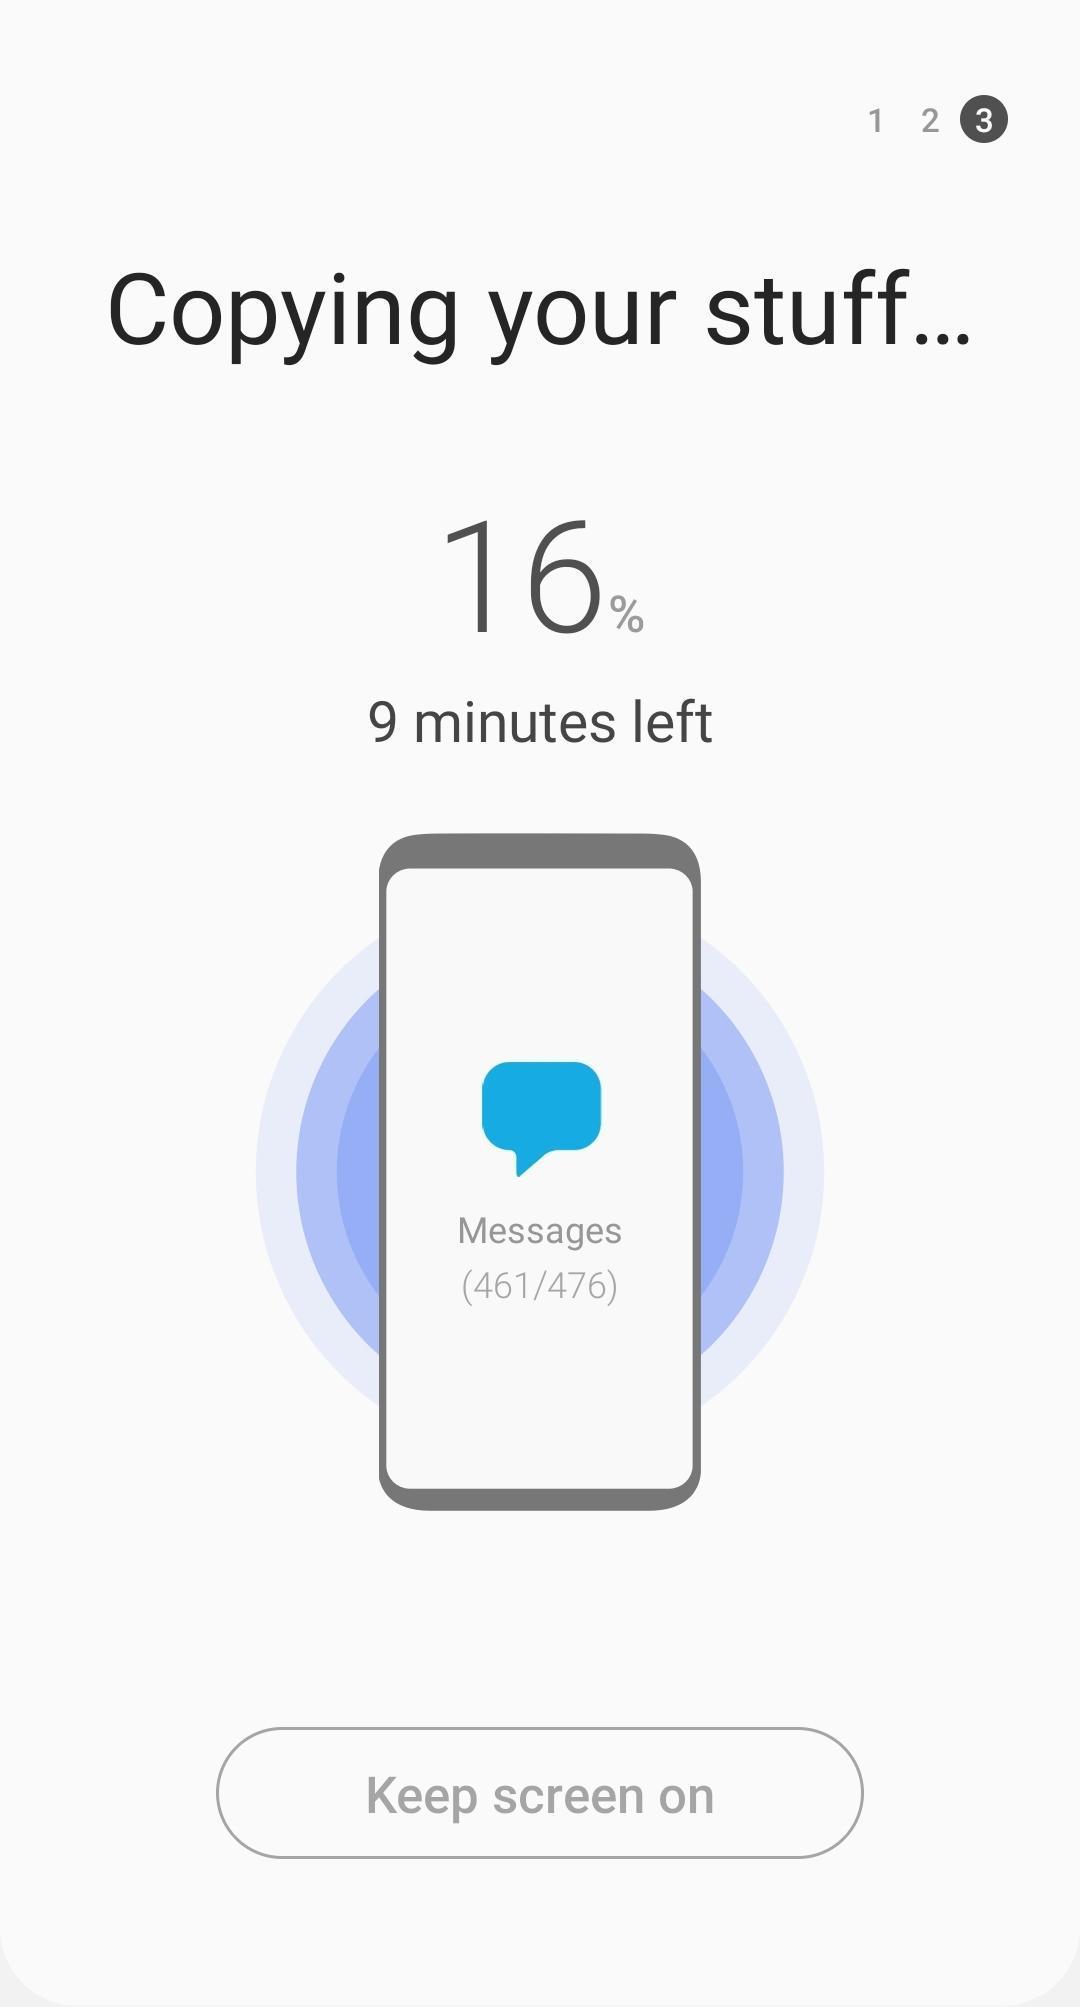 Samsung Smart Switch Mobile 3.7.09.7 Screenshot 5